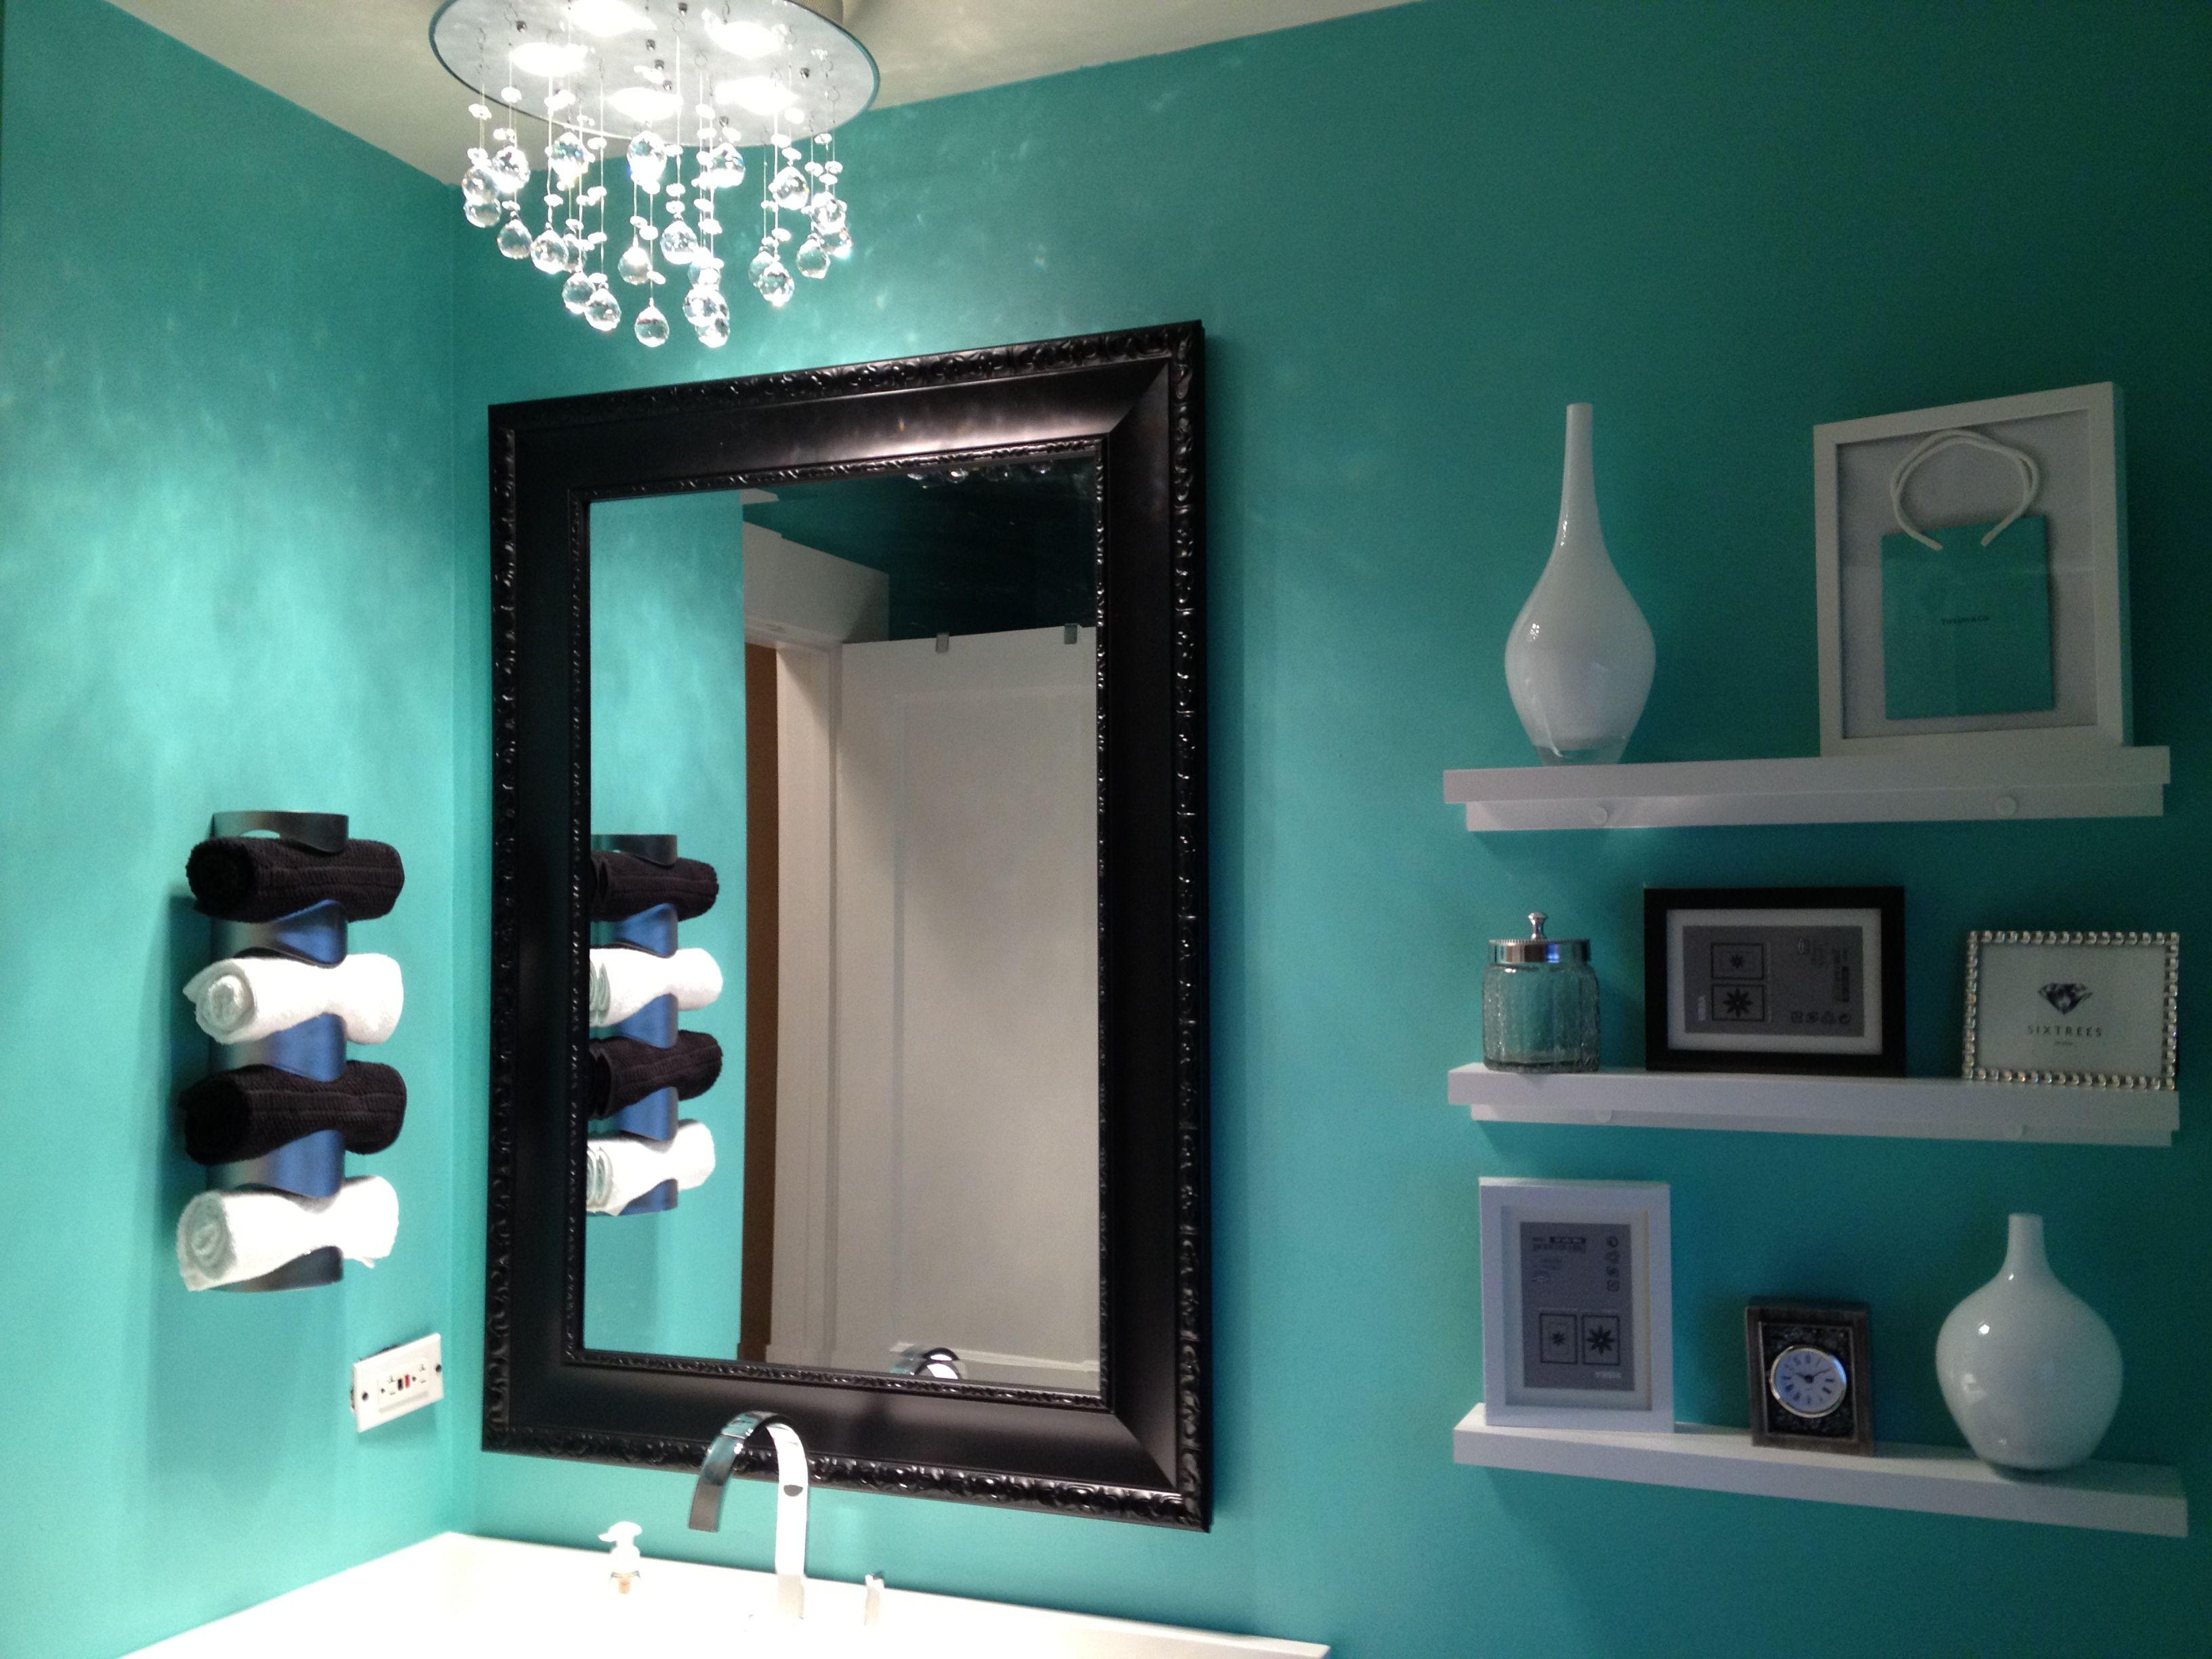 My new Tiffany bathroom | DIY Decor | Pinterest | Tiffany, Tiffany ...